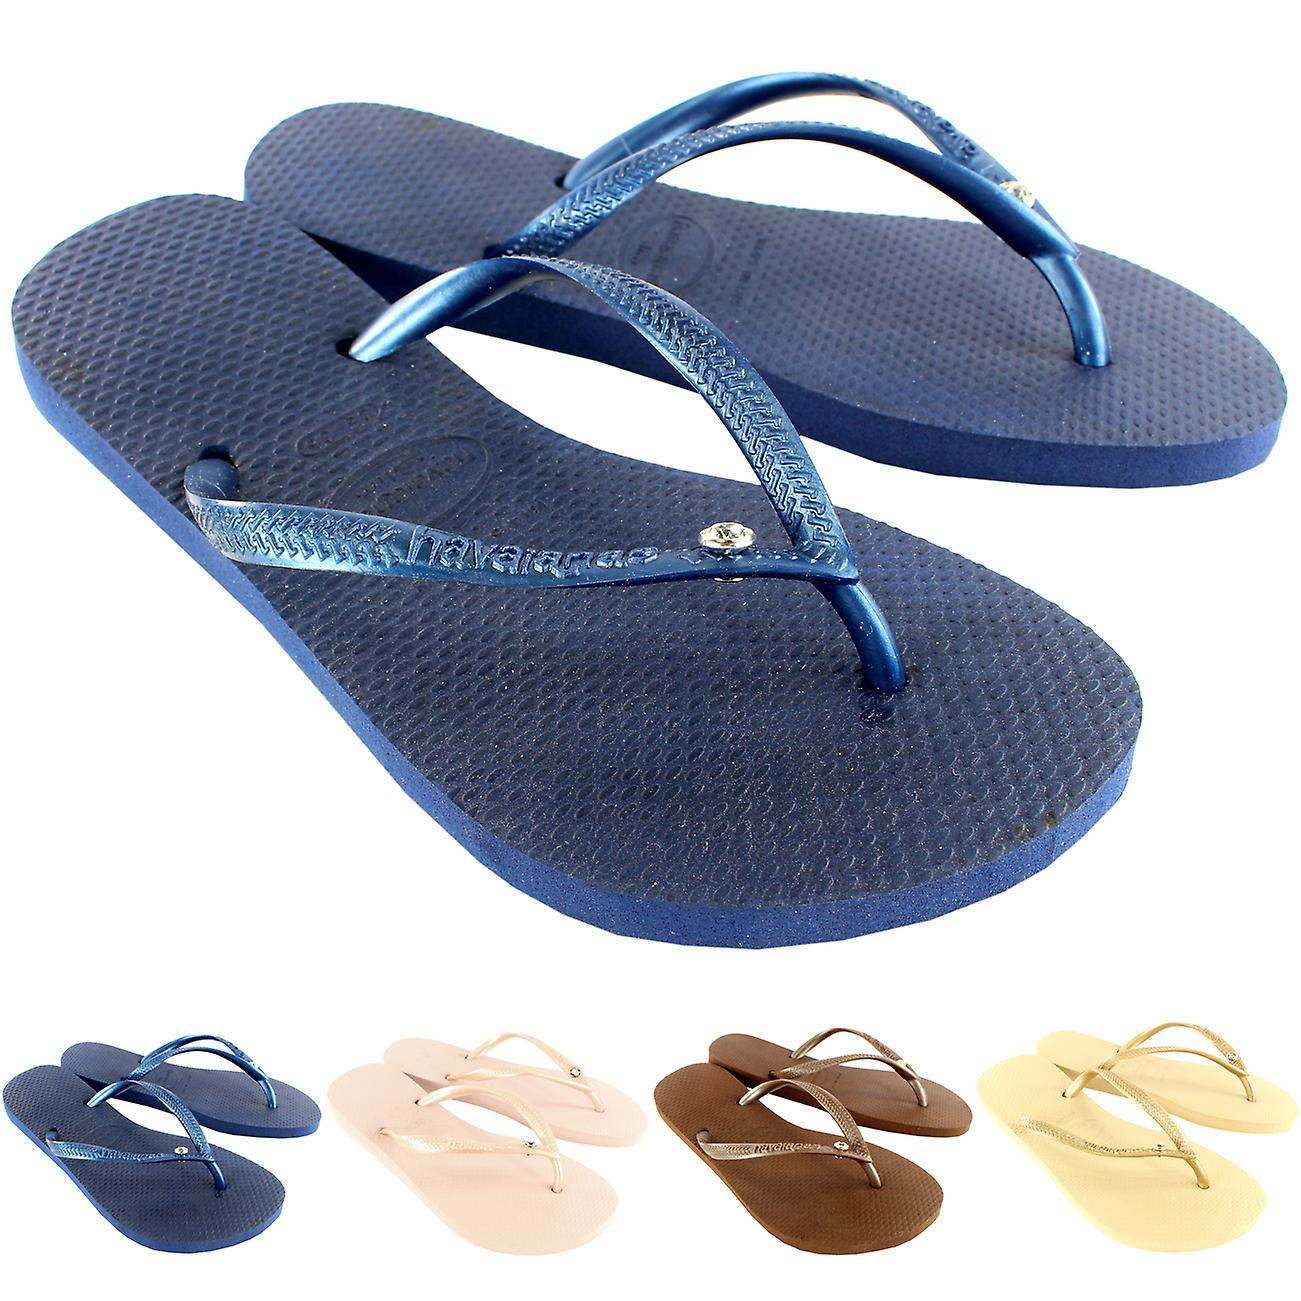 8d7ca629e Womens Havaianas Slim Crystal Glamour Sw Flip Flop Summer Sandal ...